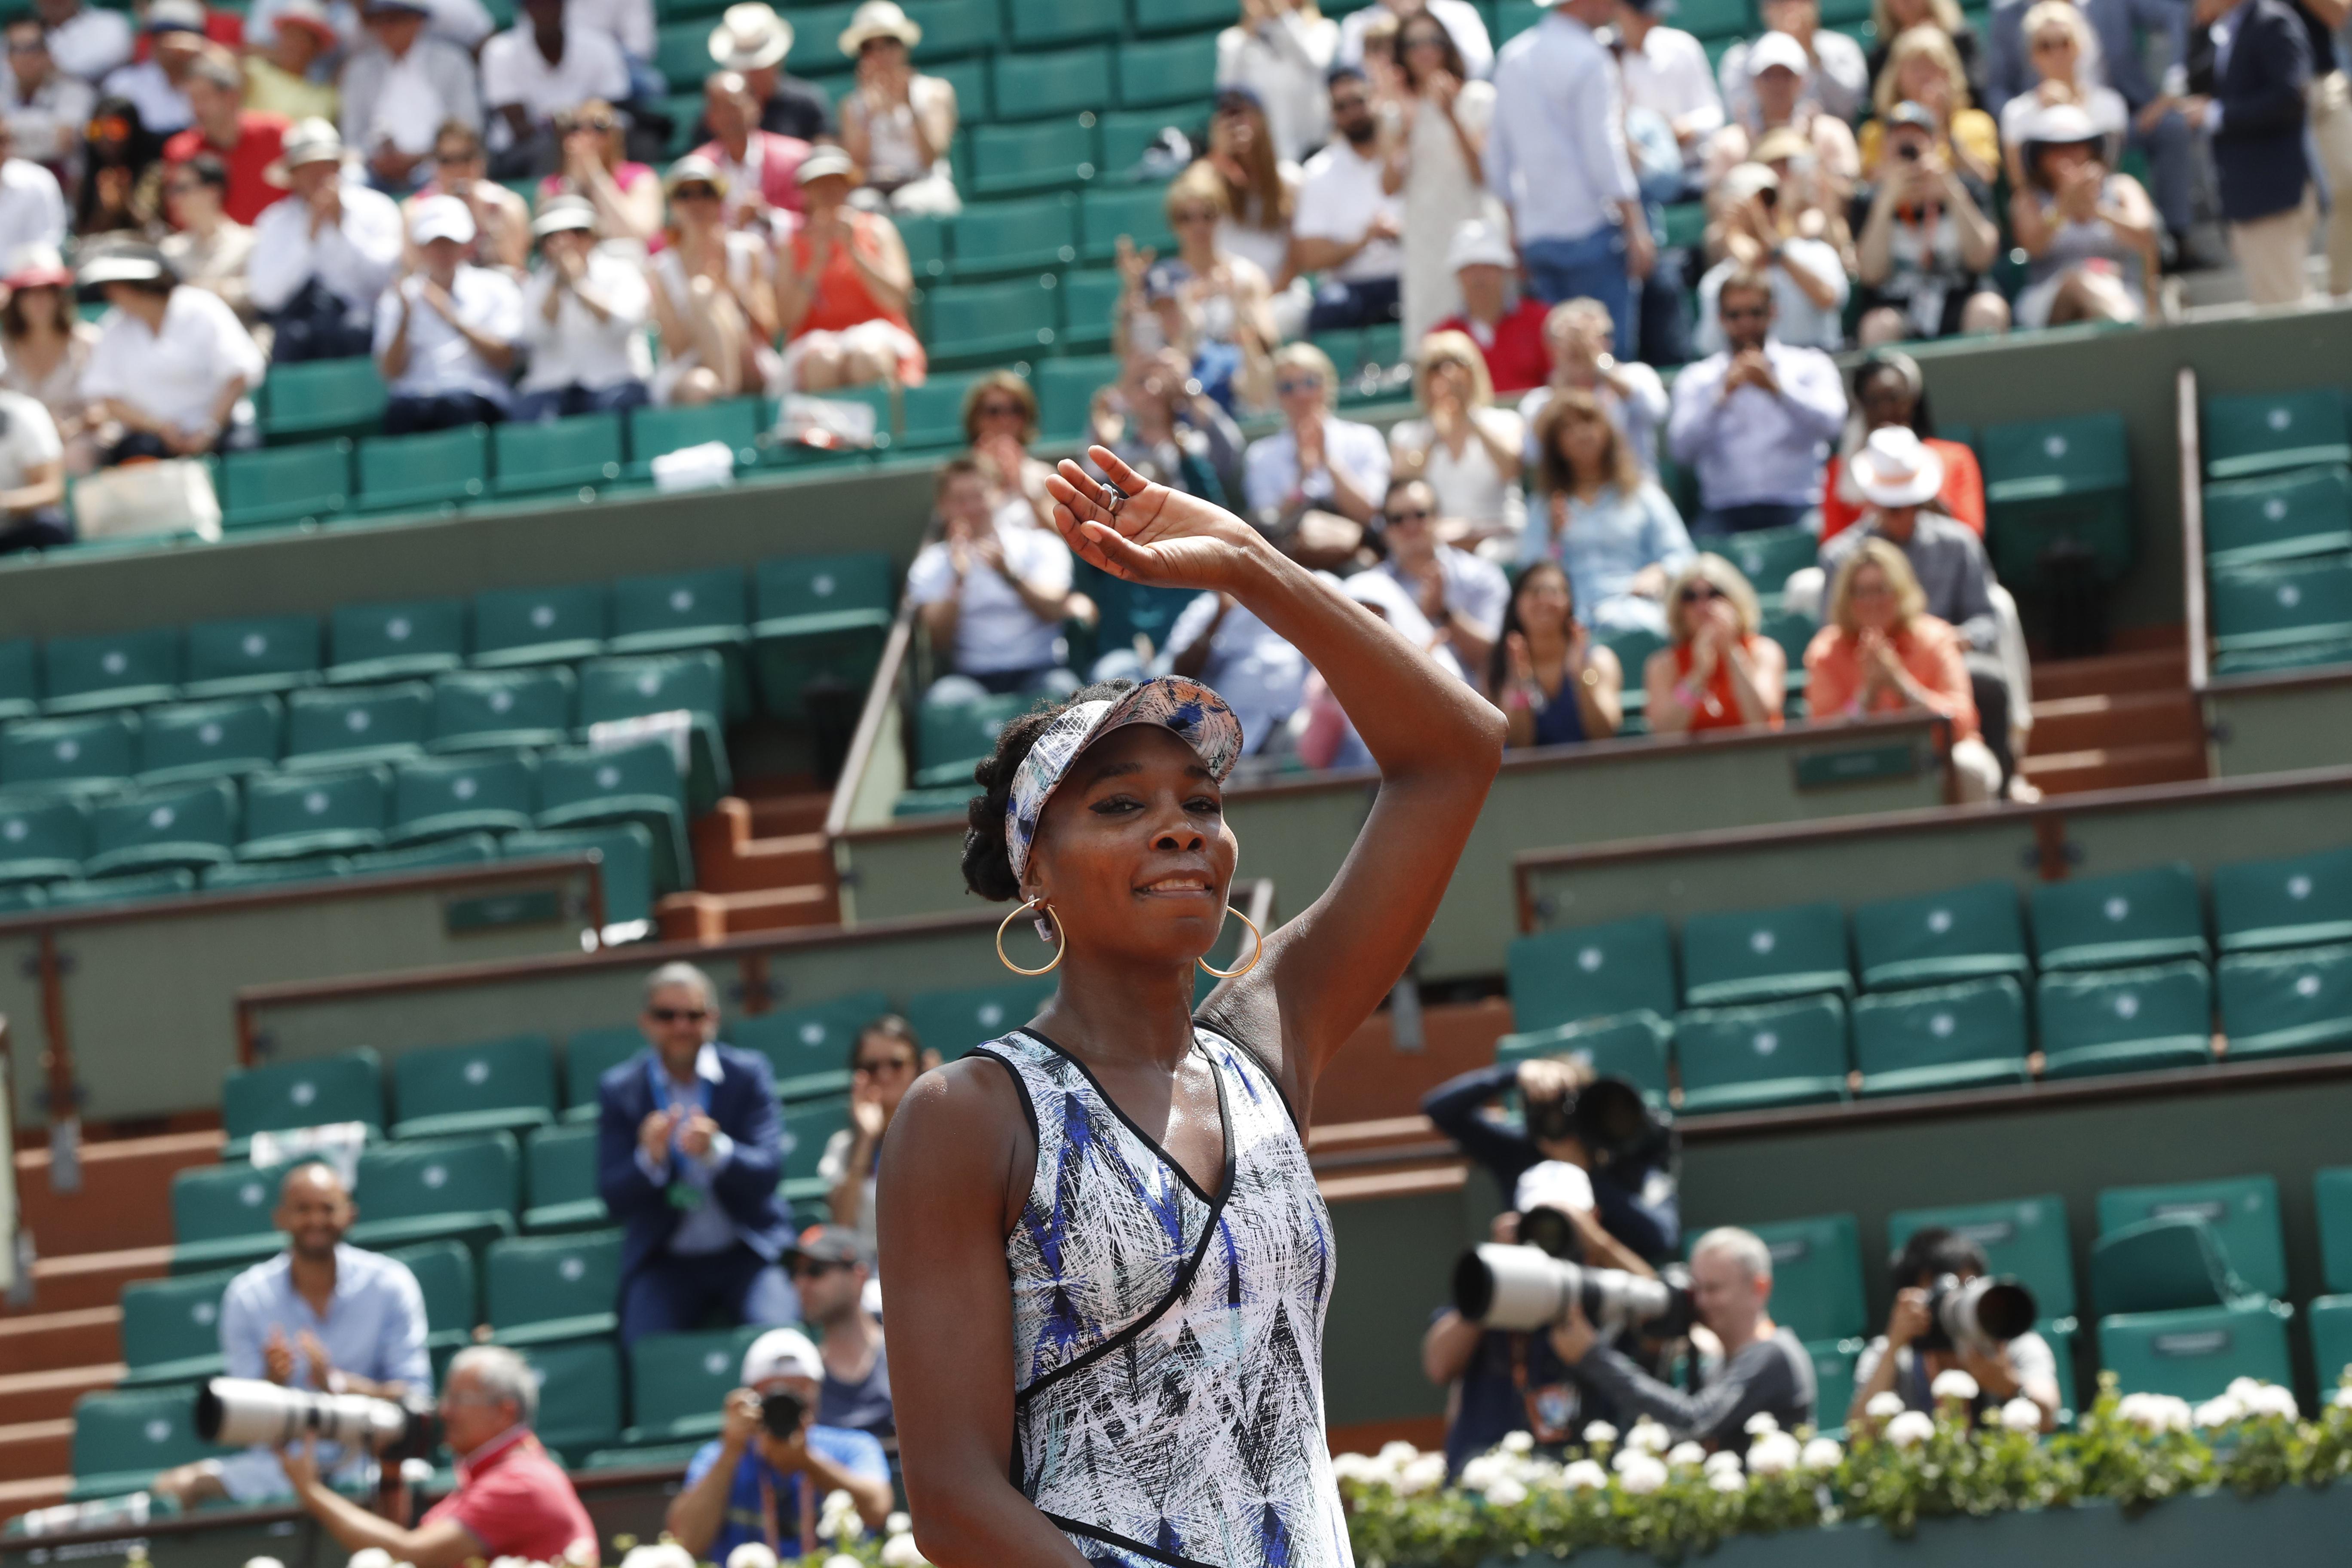 Venus Williams of the U.S. celebrates winning 6-3, 6-1, against Japan's Kurumi Nara during their second round match of the French Open tennis tournament at the Roland Garros stadium, in Paris, France. Wednesday, May 31, 2017. (AP Photo/Petr David Josek)